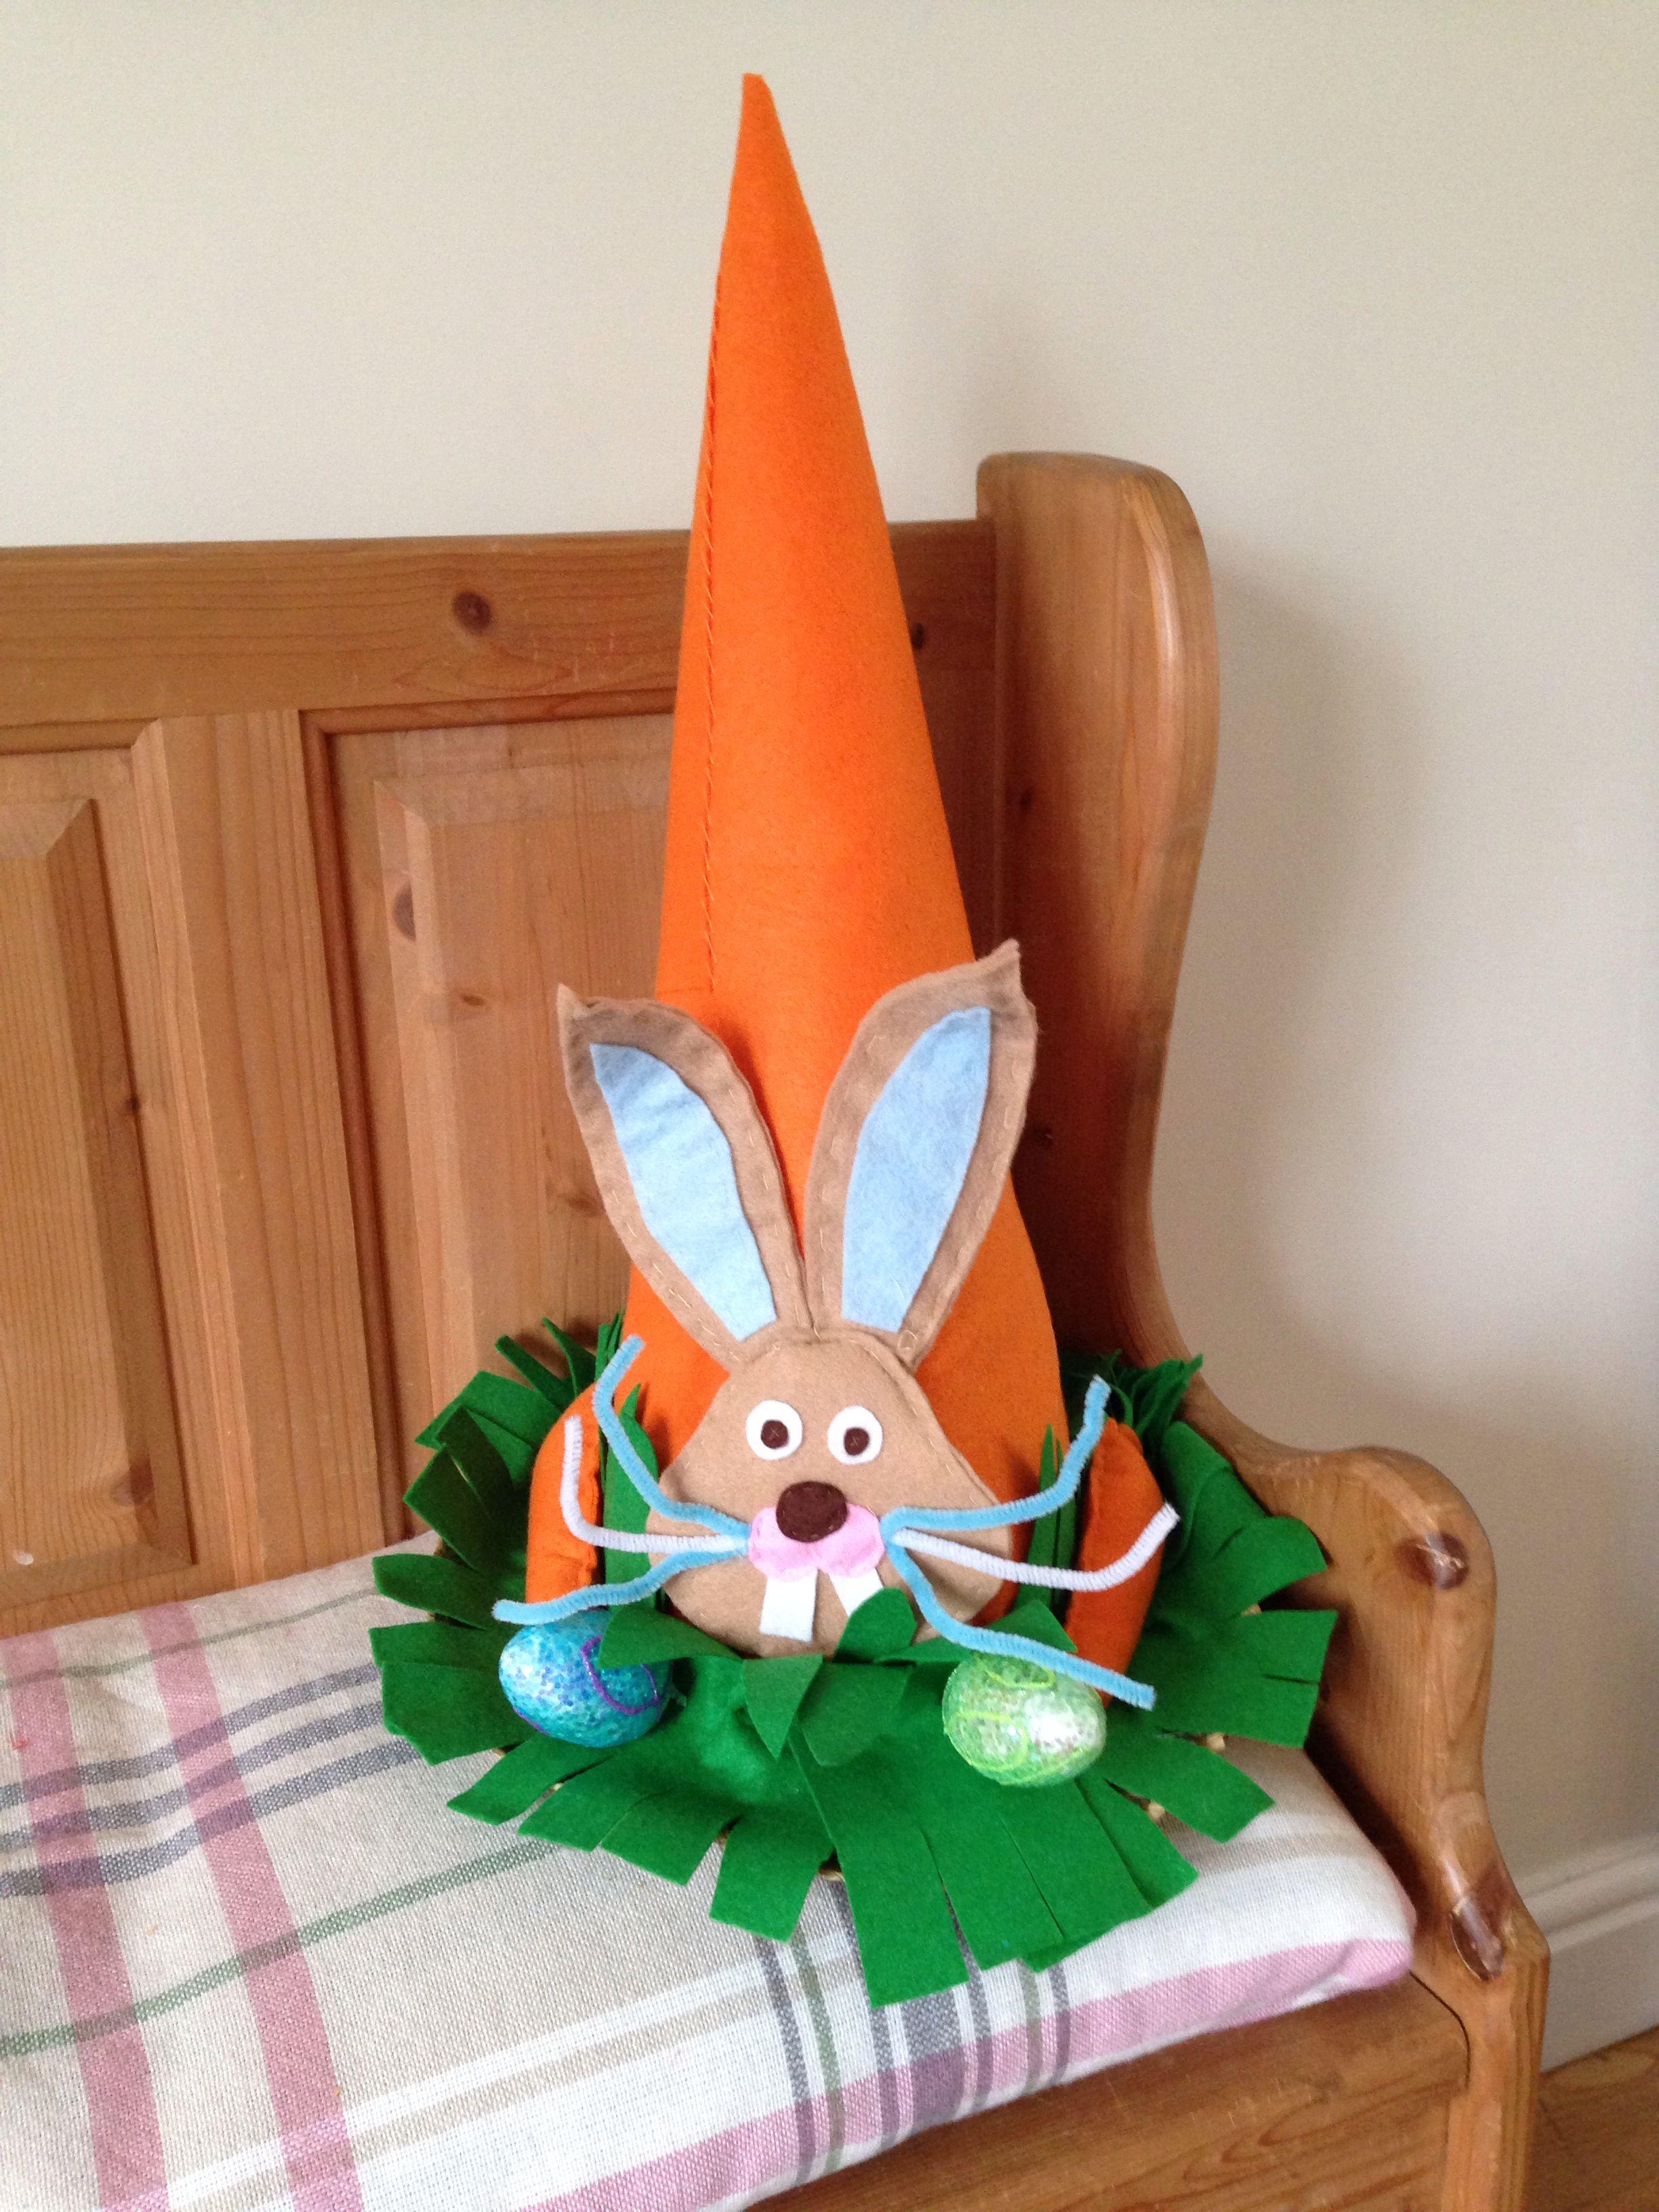 Easter bonnet 2014 attempt at an easter bonnet for my boy harri easter bonnet 2014 attempt at an easter bonnet for my boy harri easterbonnet negle Gallery